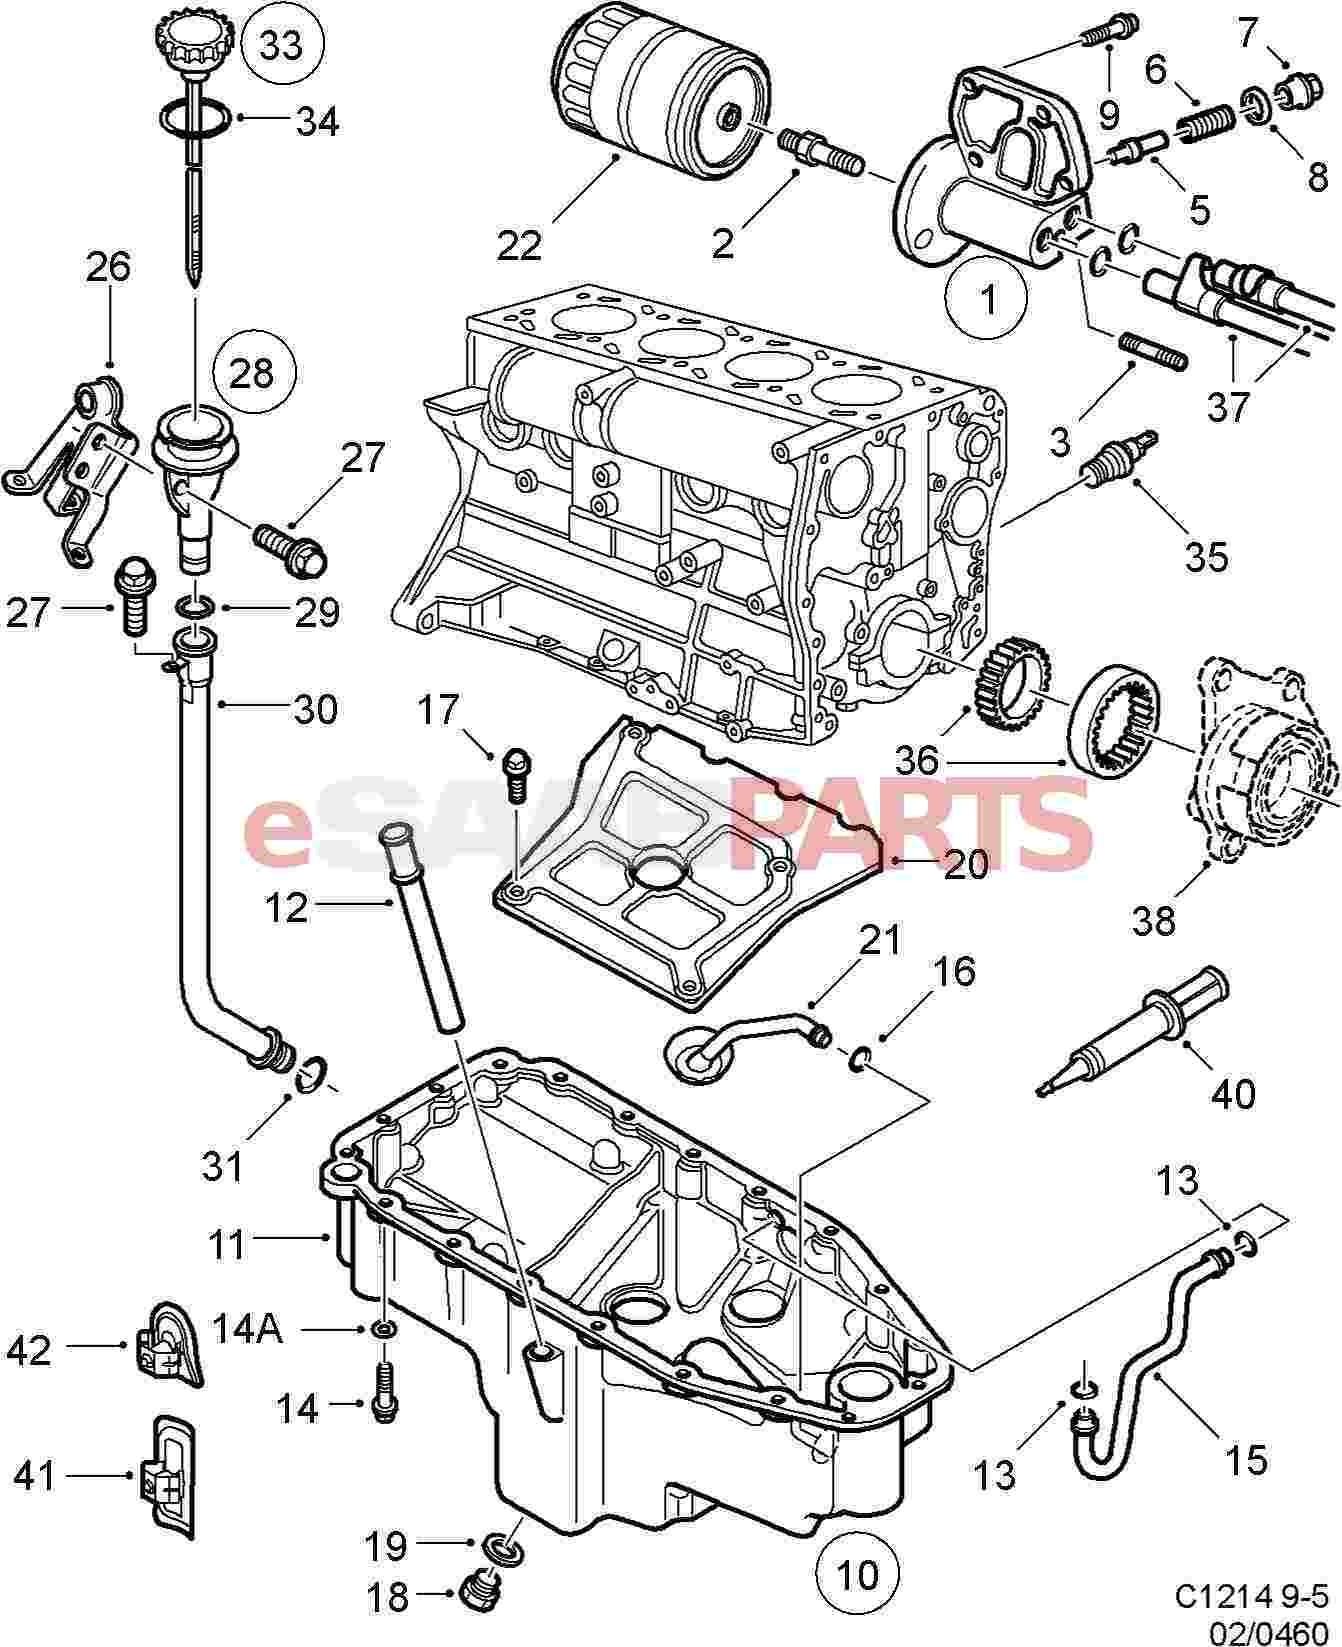 hight resolution of saab 95 engine diagram u2022 wiring diagram for free